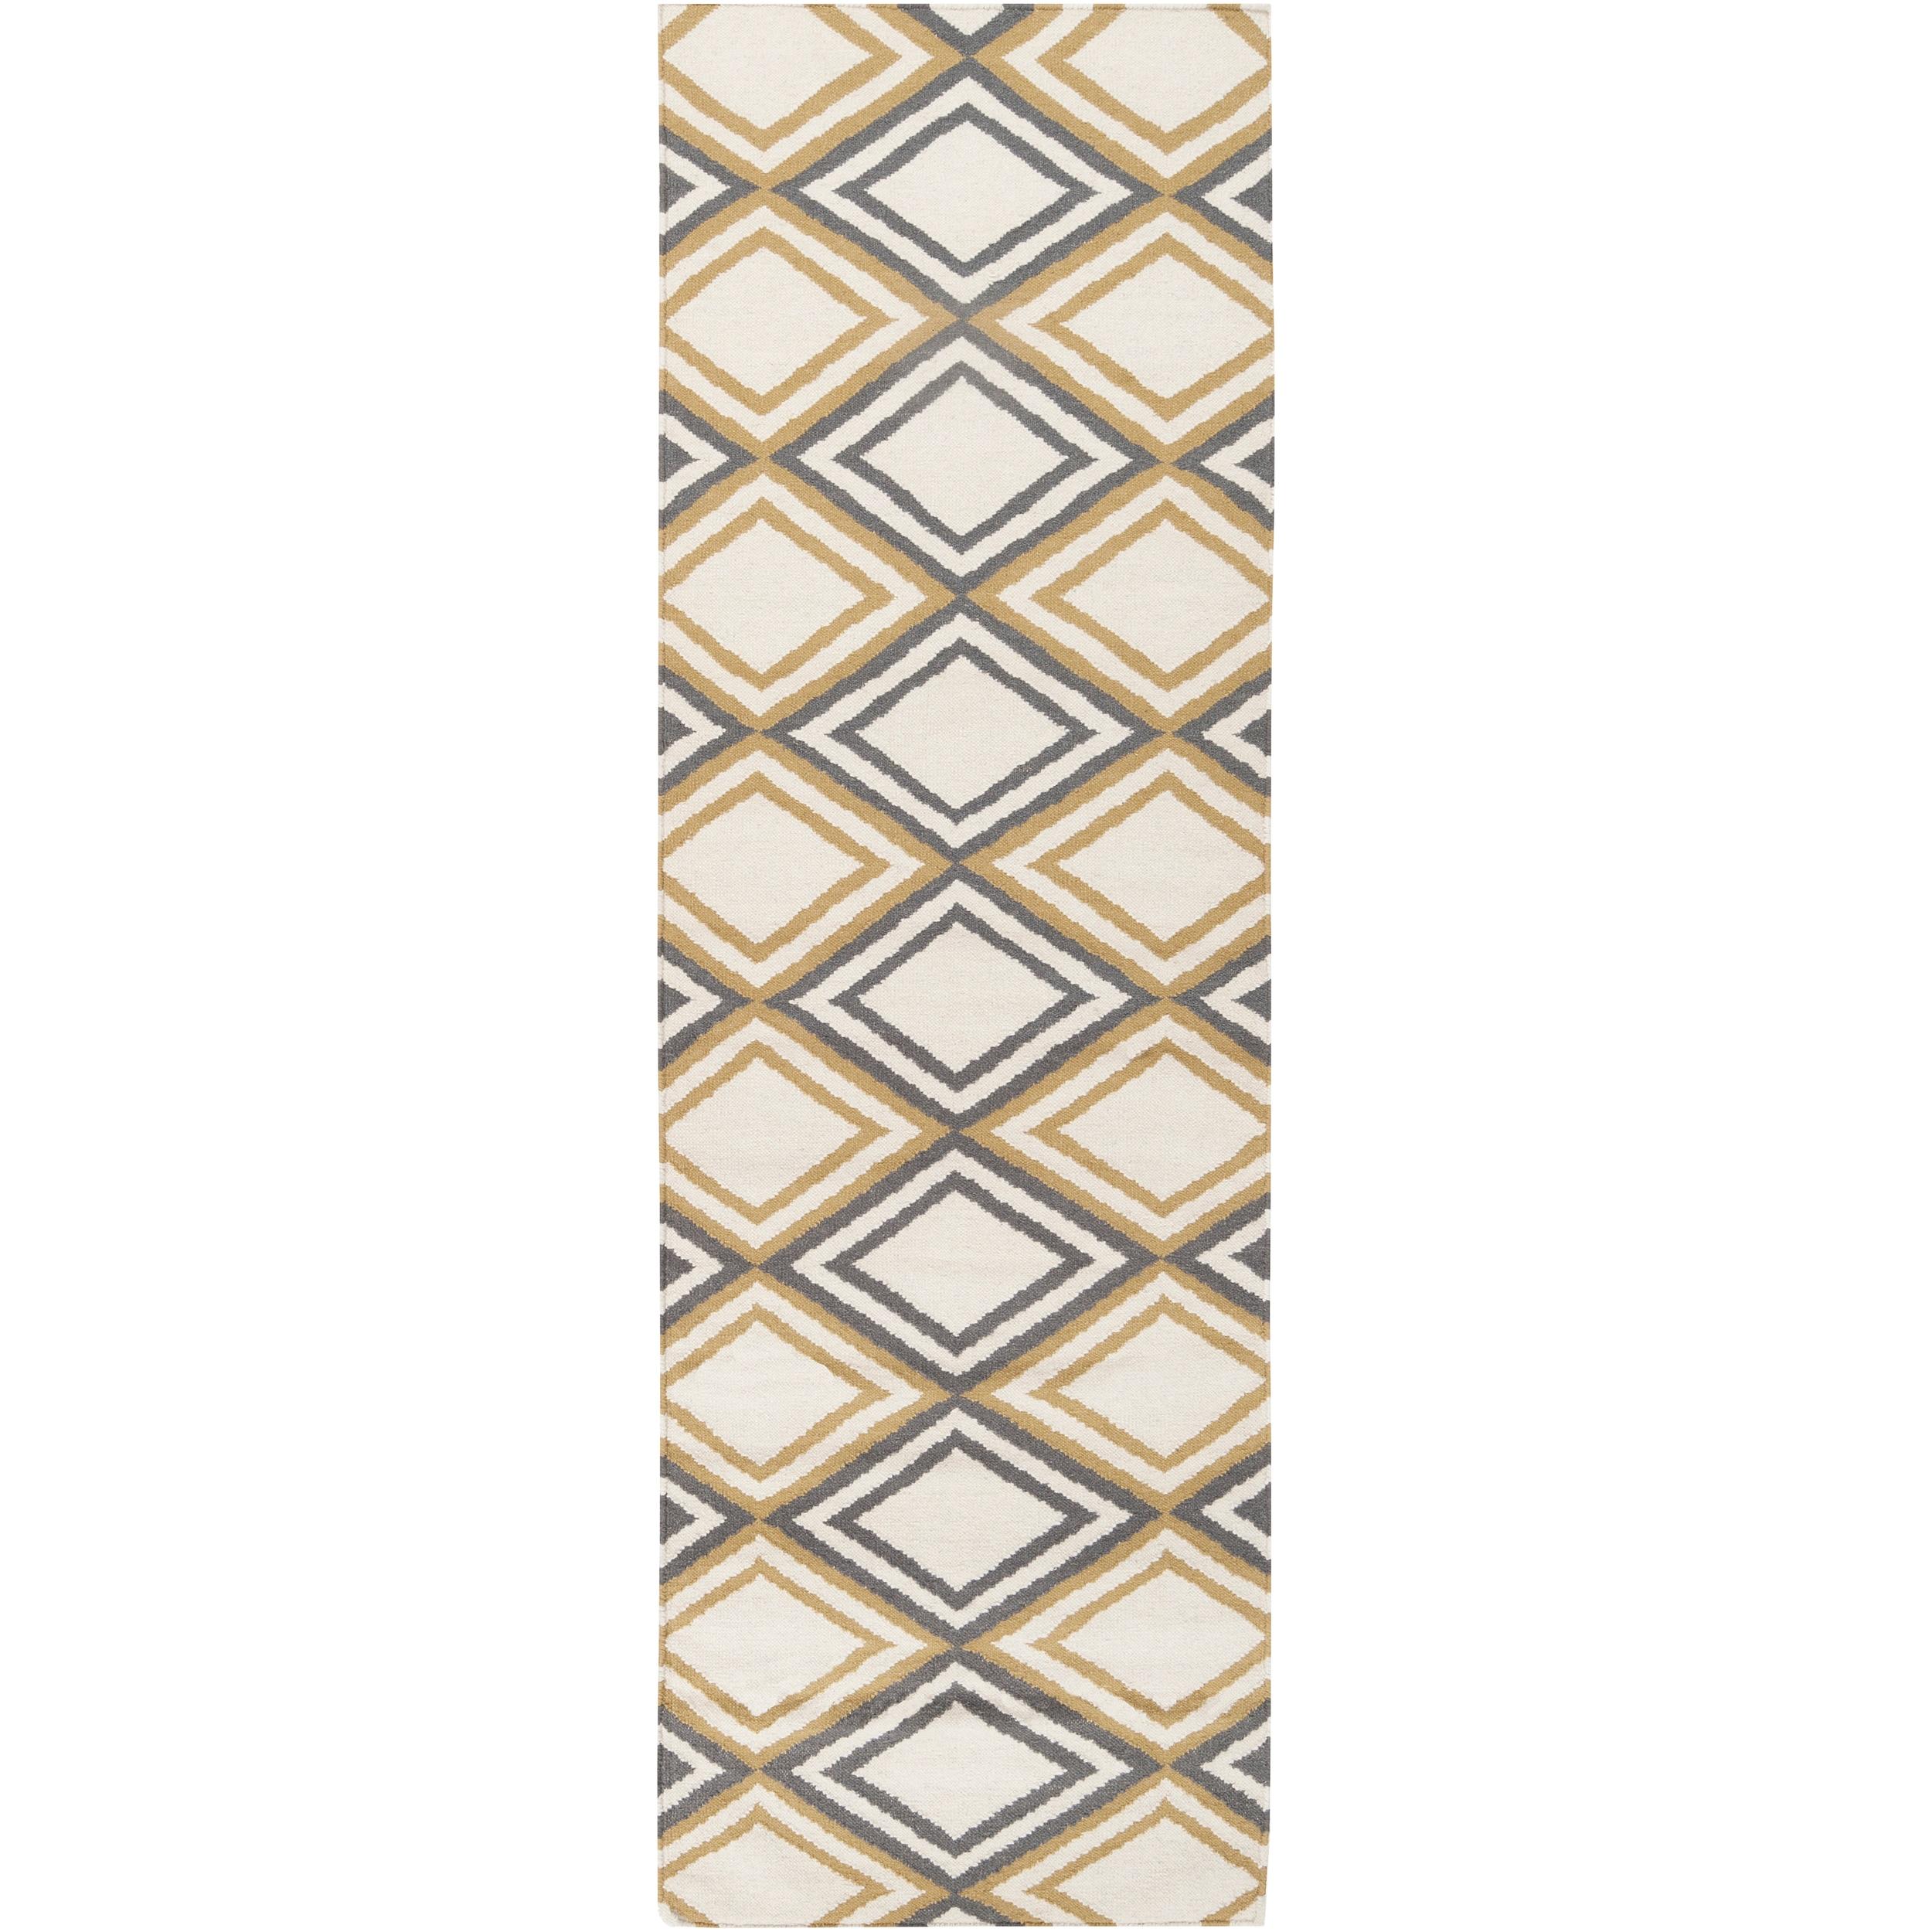 Hand-woven Caroni 'Brown' Wool Rug (2'6 x 8')